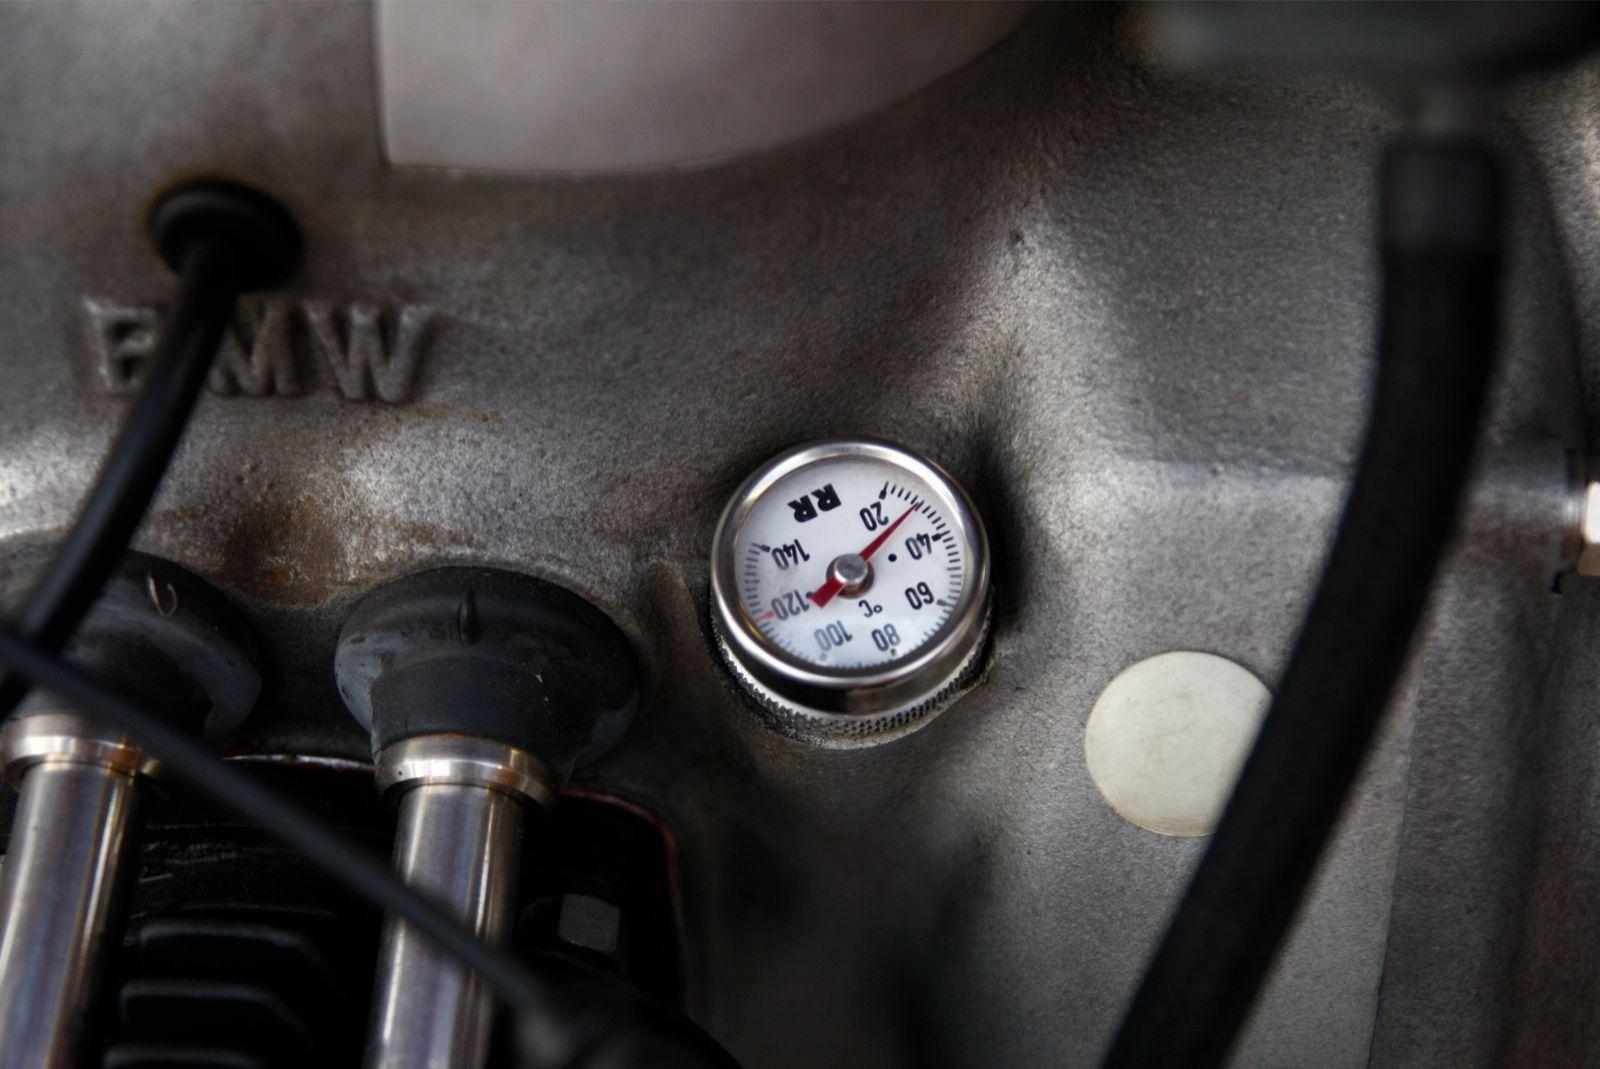 BMW R60/2 - 1966 - Engine Oil Pressure Gauge.